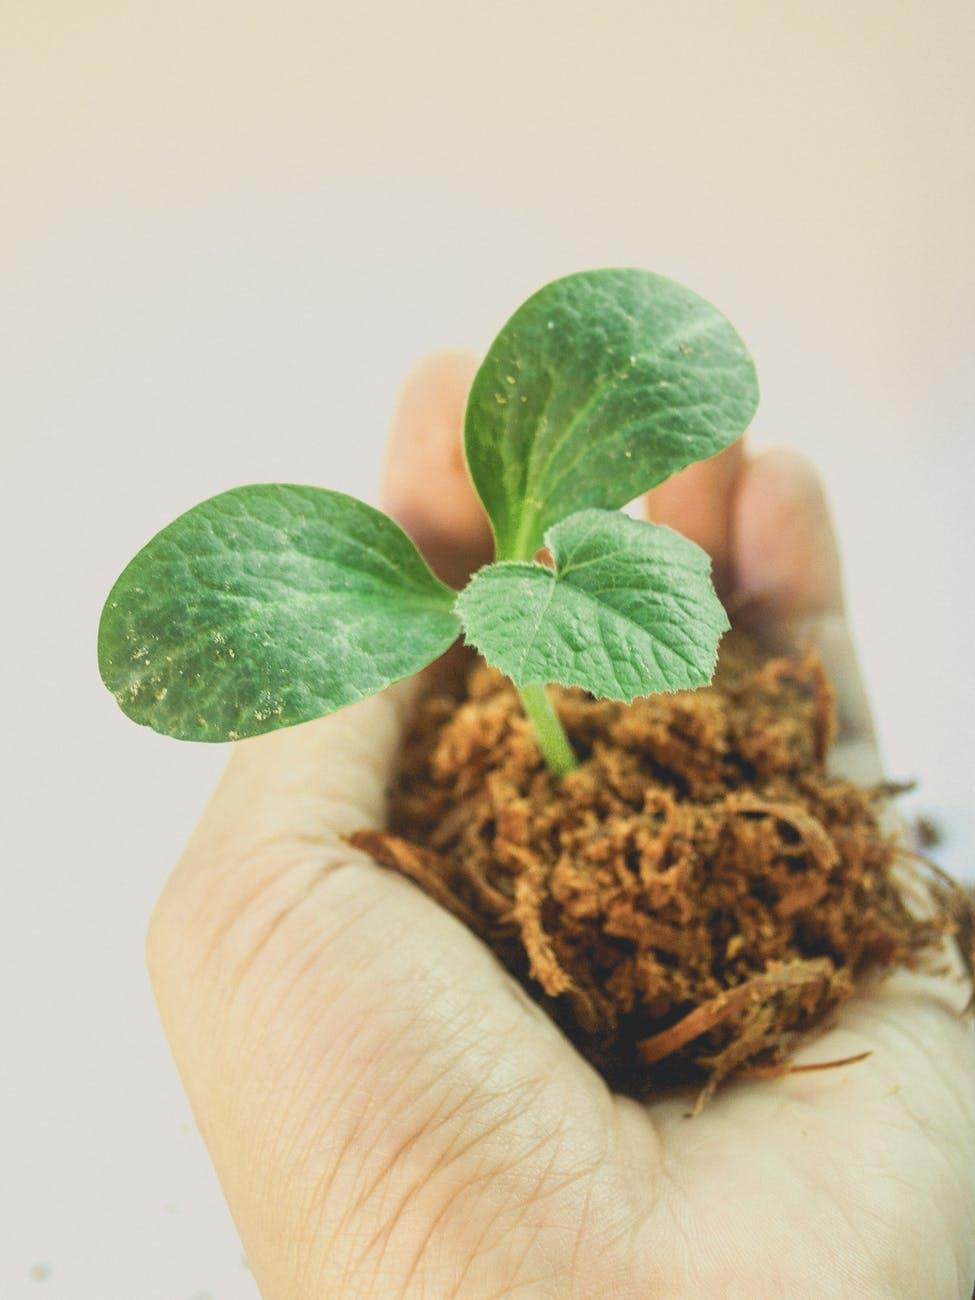 Plant a sapling. Save the environment